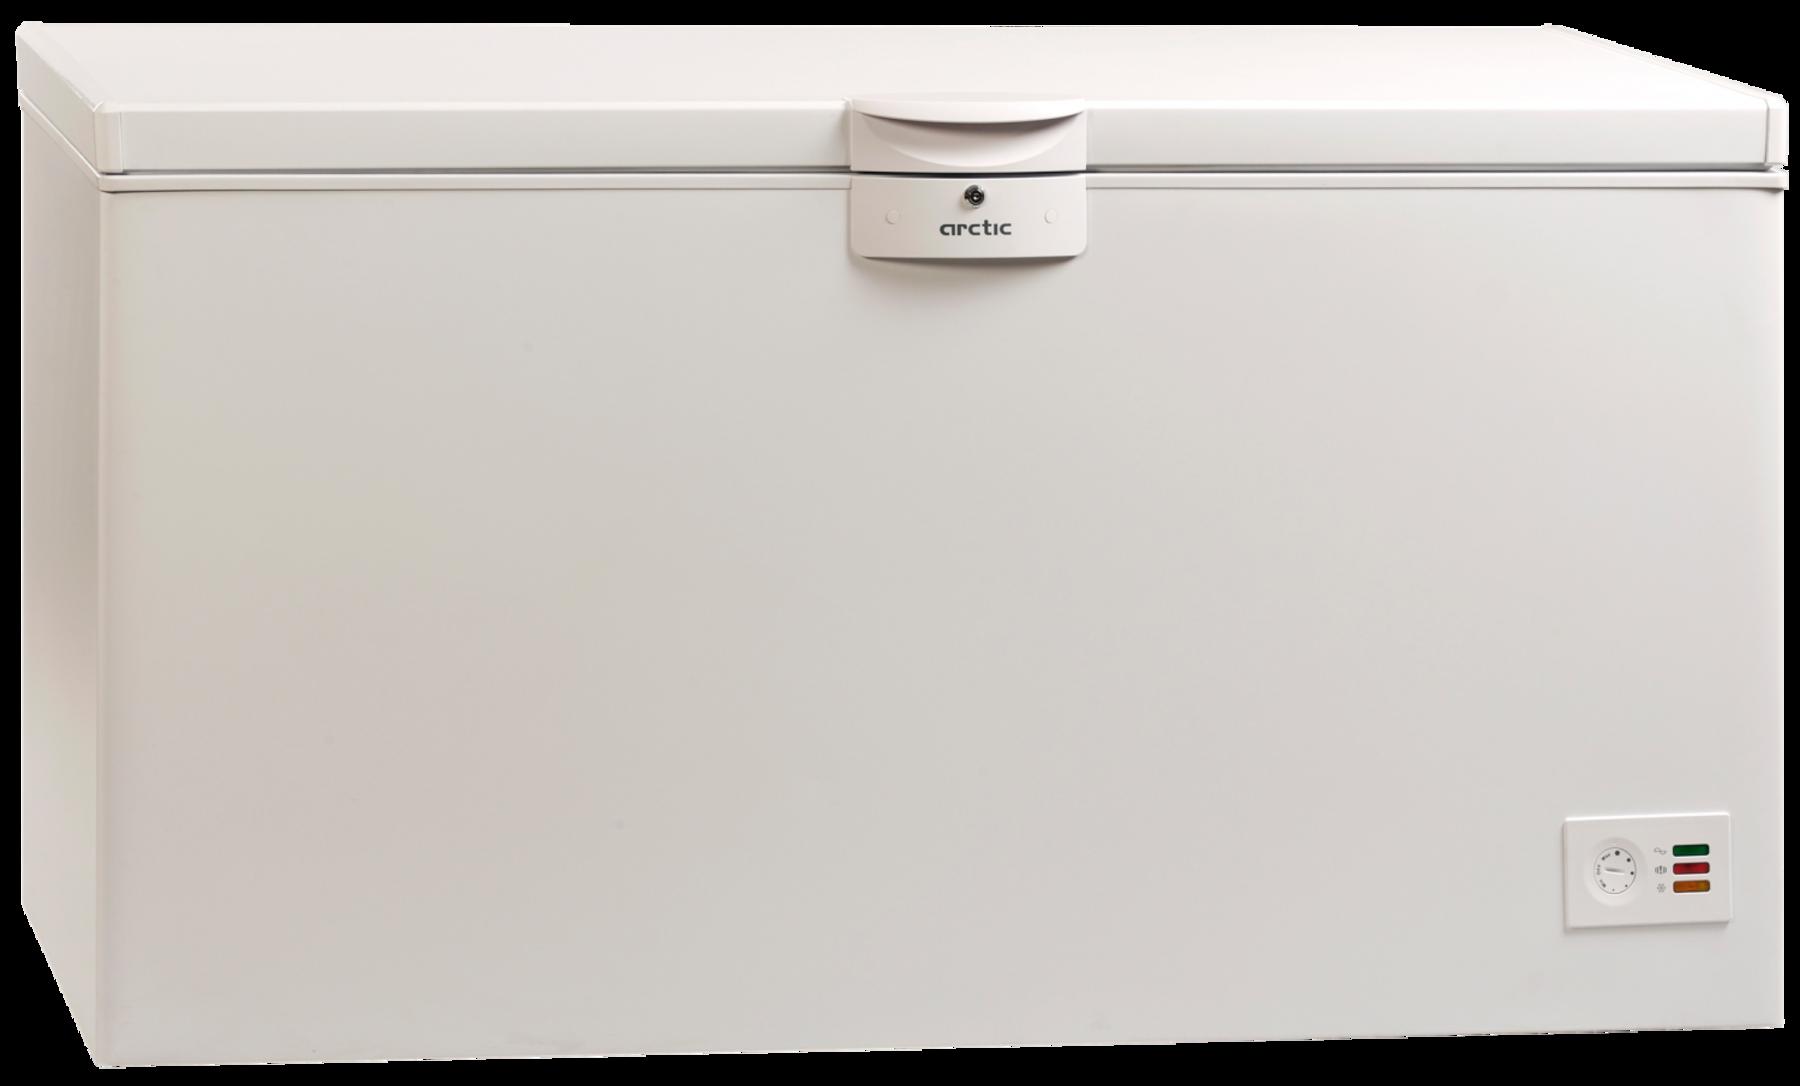 Lada frigorifica Arctic O47+, 451 l, Clasa A+, Indicatori LED, Yala, 3 cosuri, L 155 cm, Alb